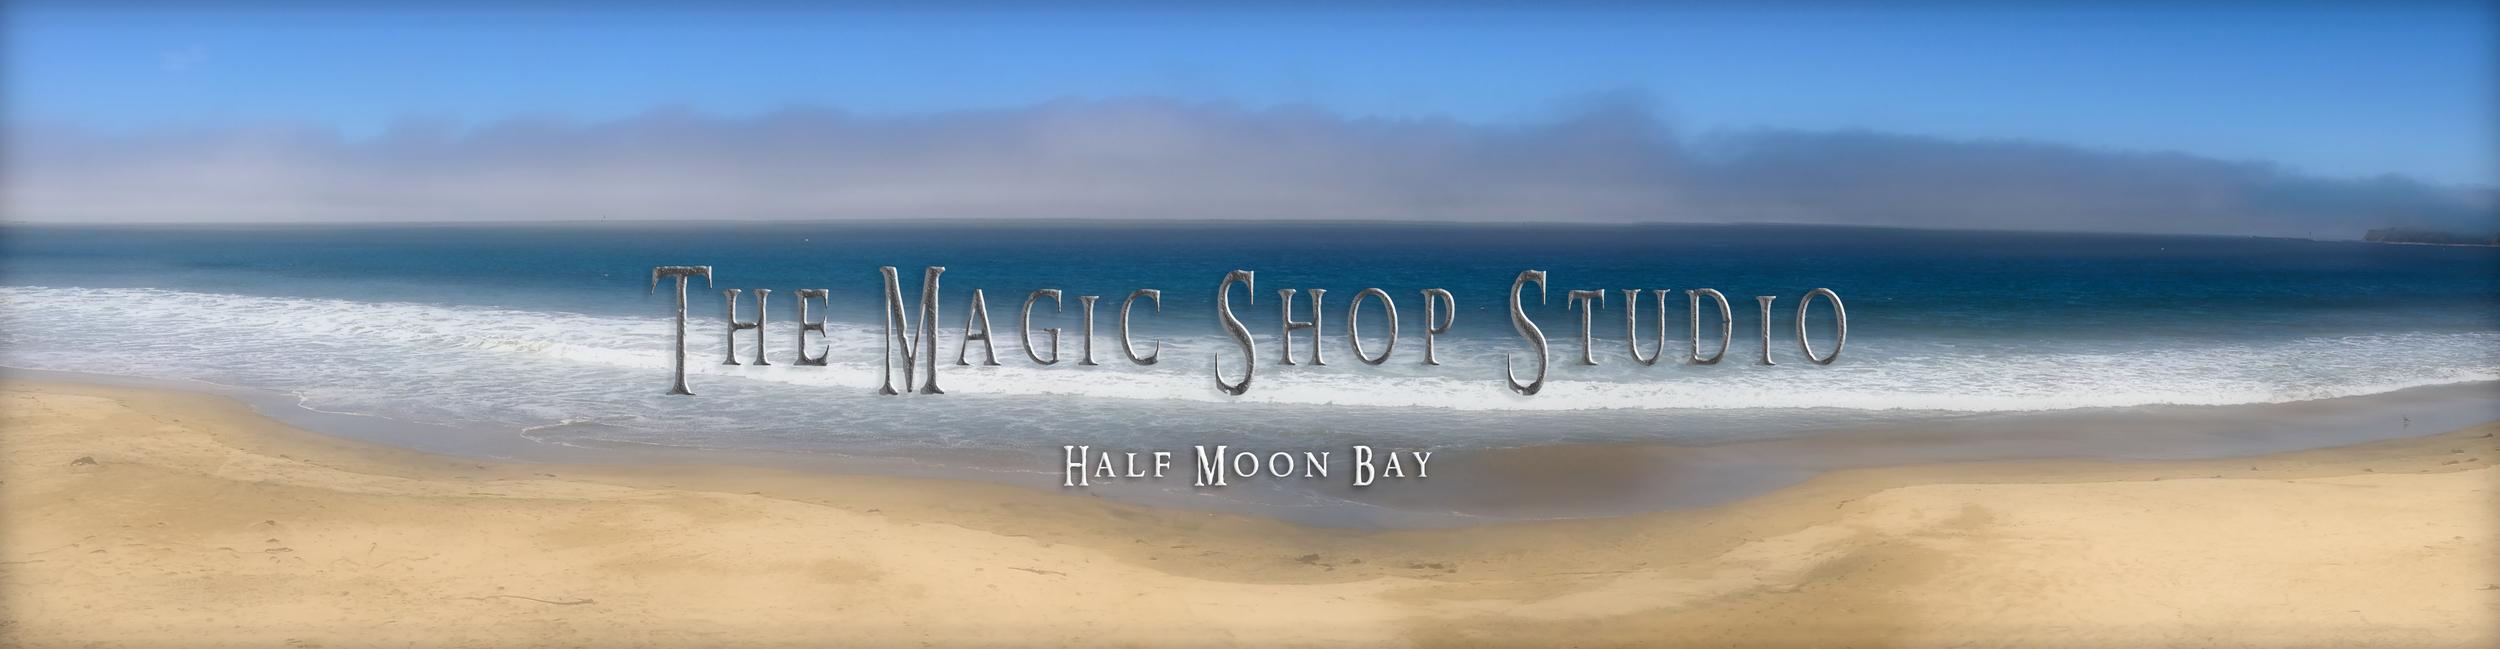 The Magic Shop Studio in Half Moon Bay